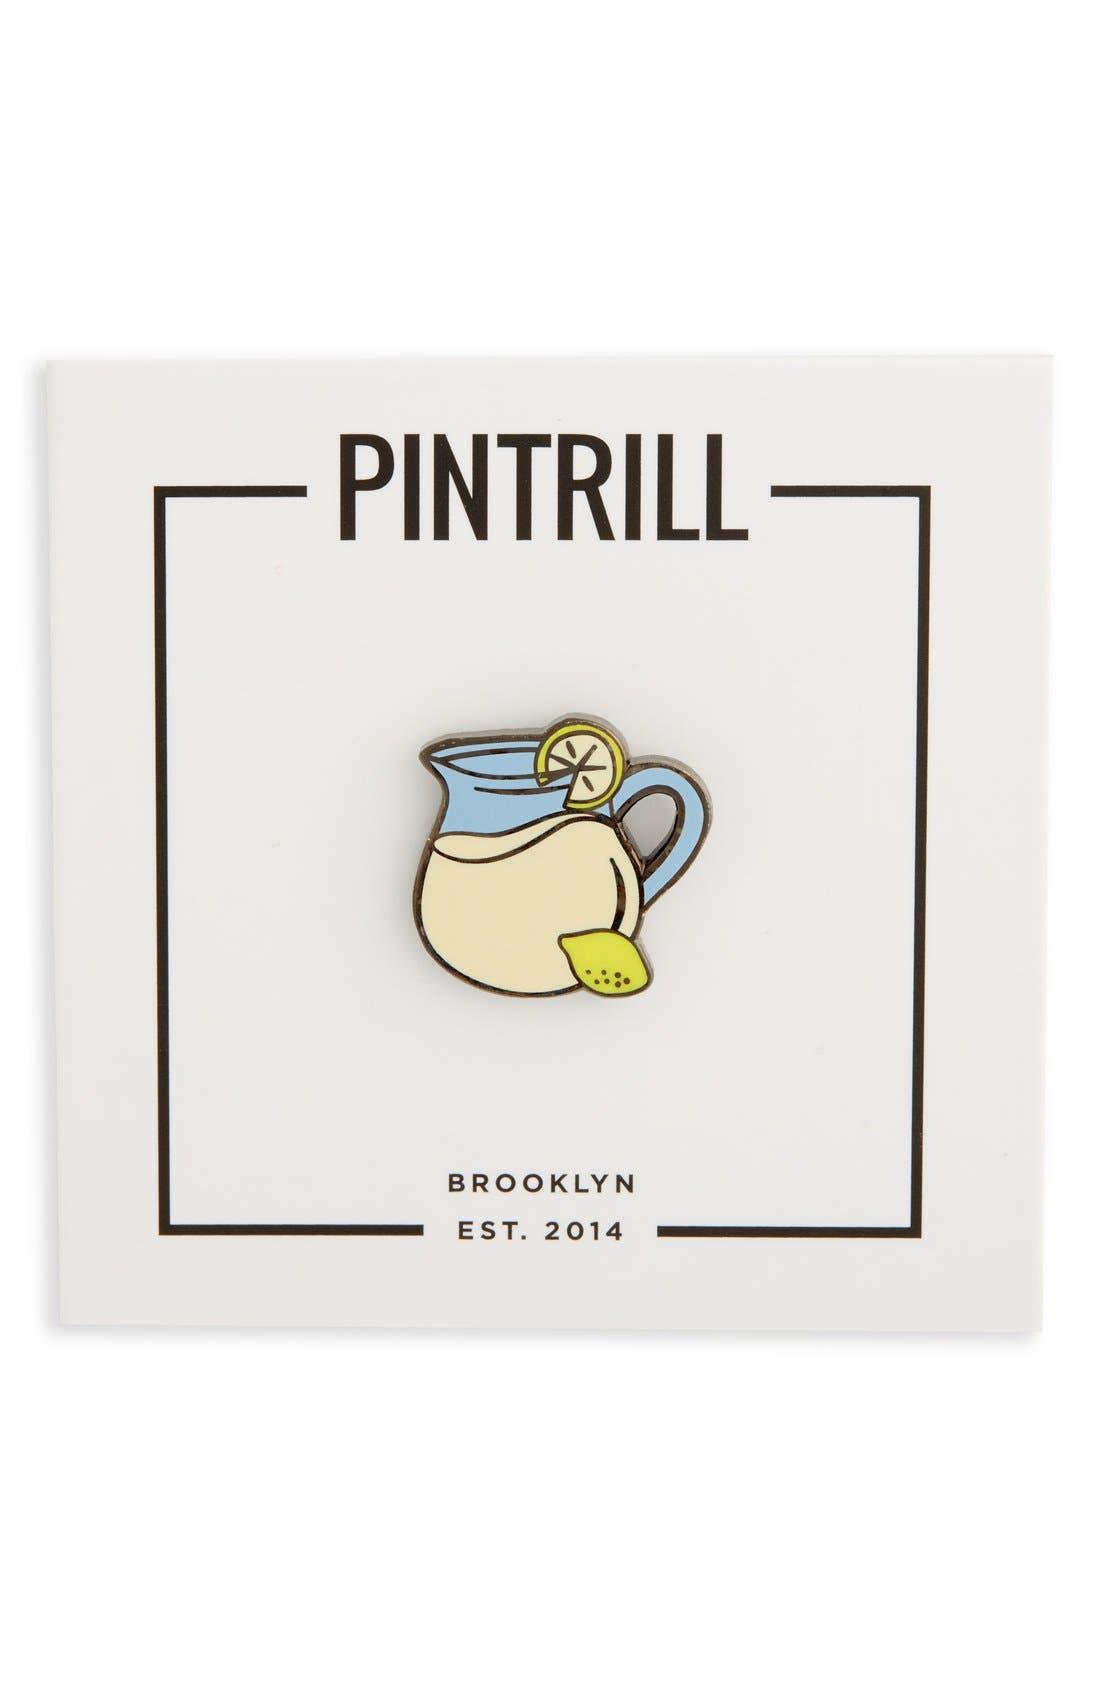 Alternate Image 1 Selected - PINTRILL 'Lemonade Pitcher' Fashion Accessory Pin